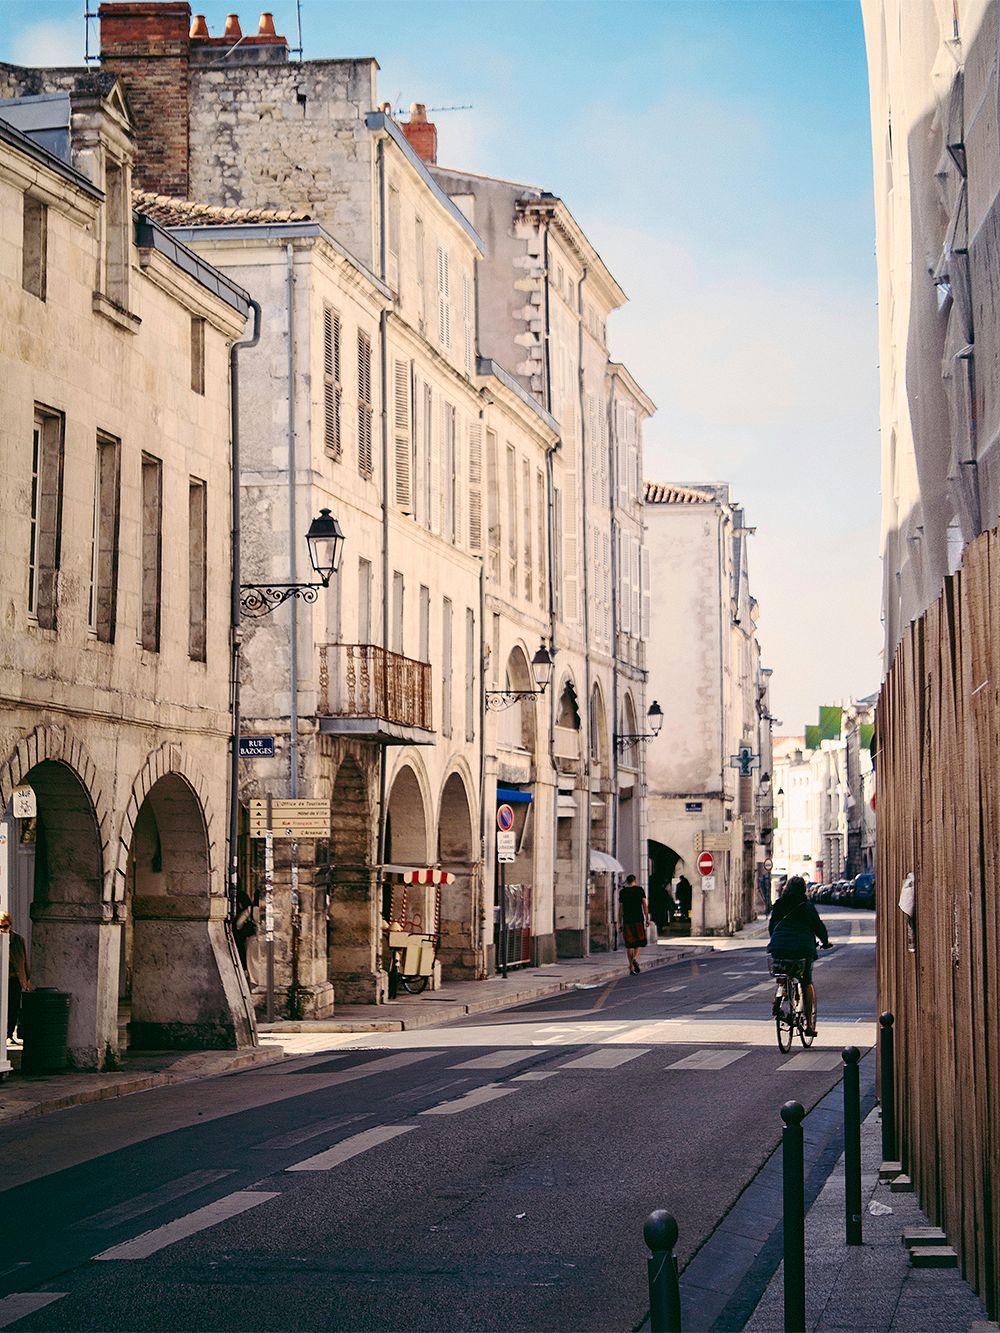 Biking trips in spectacular places: La Vélodyssée, France